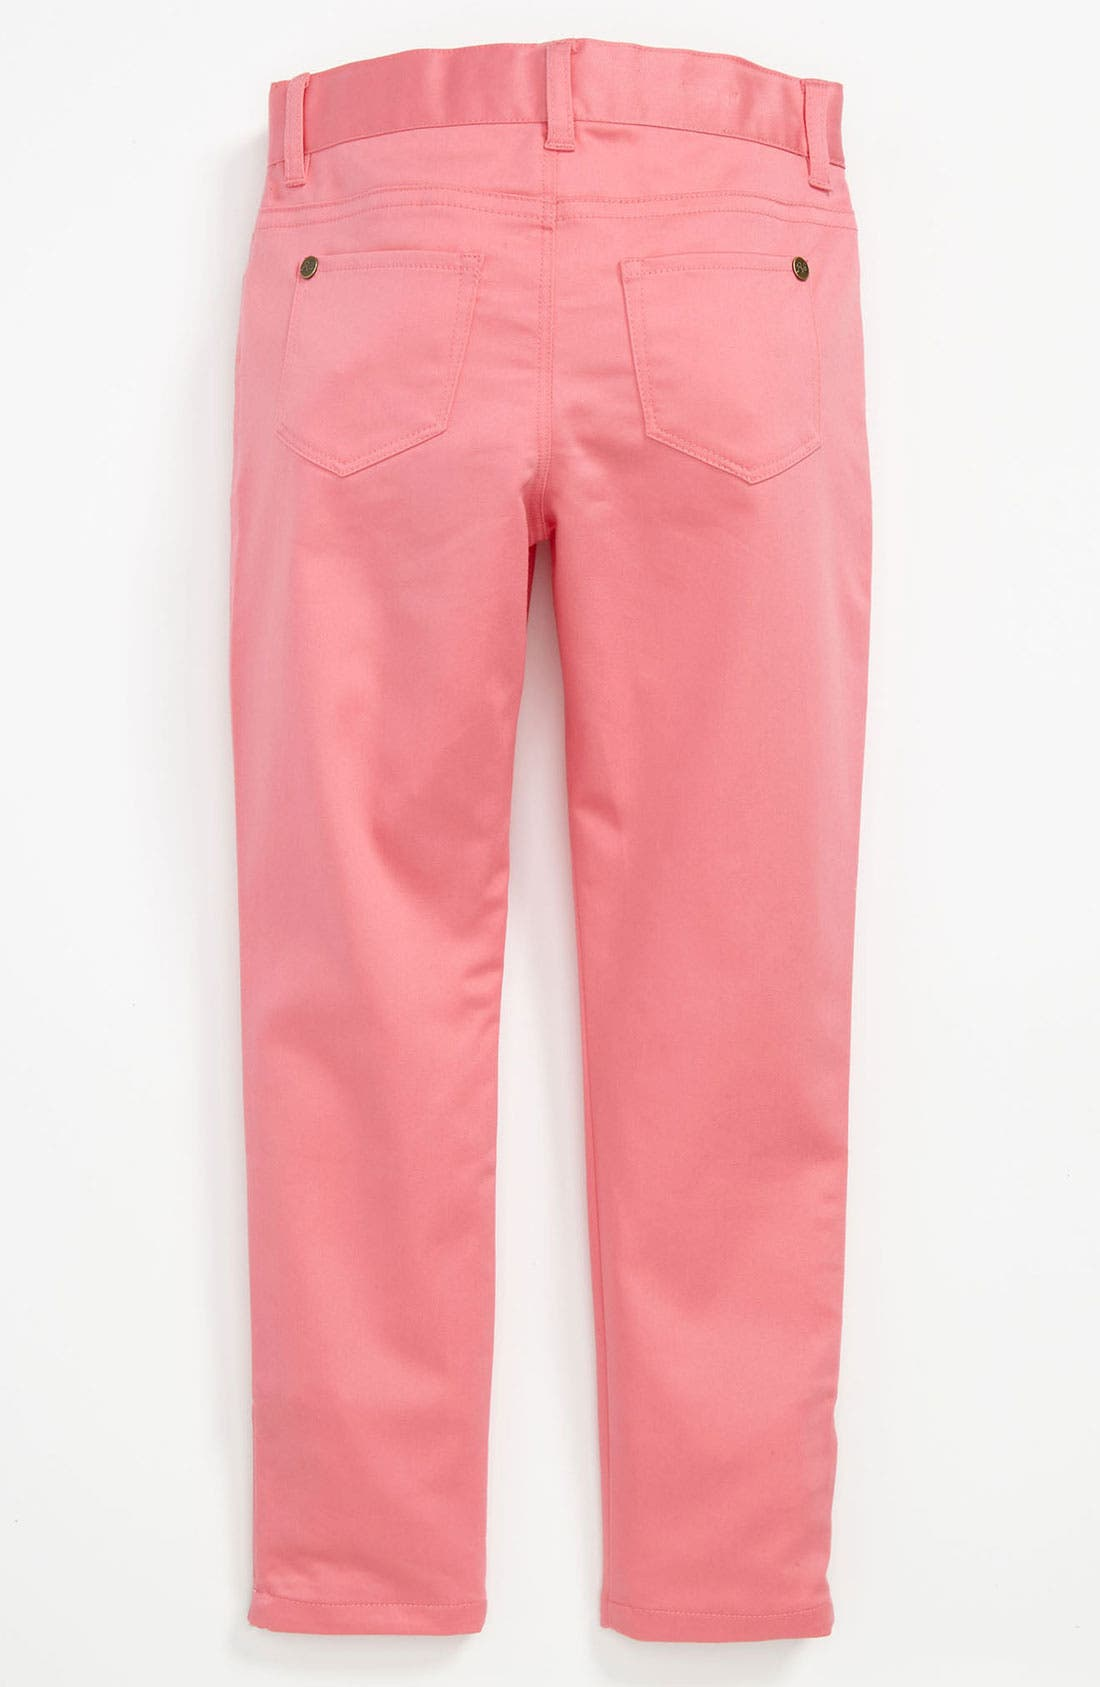 Alternate Image 1 Selected - Ruby & Bloom 'Ana' Ankle Pants (Little Girls & Big Girls)